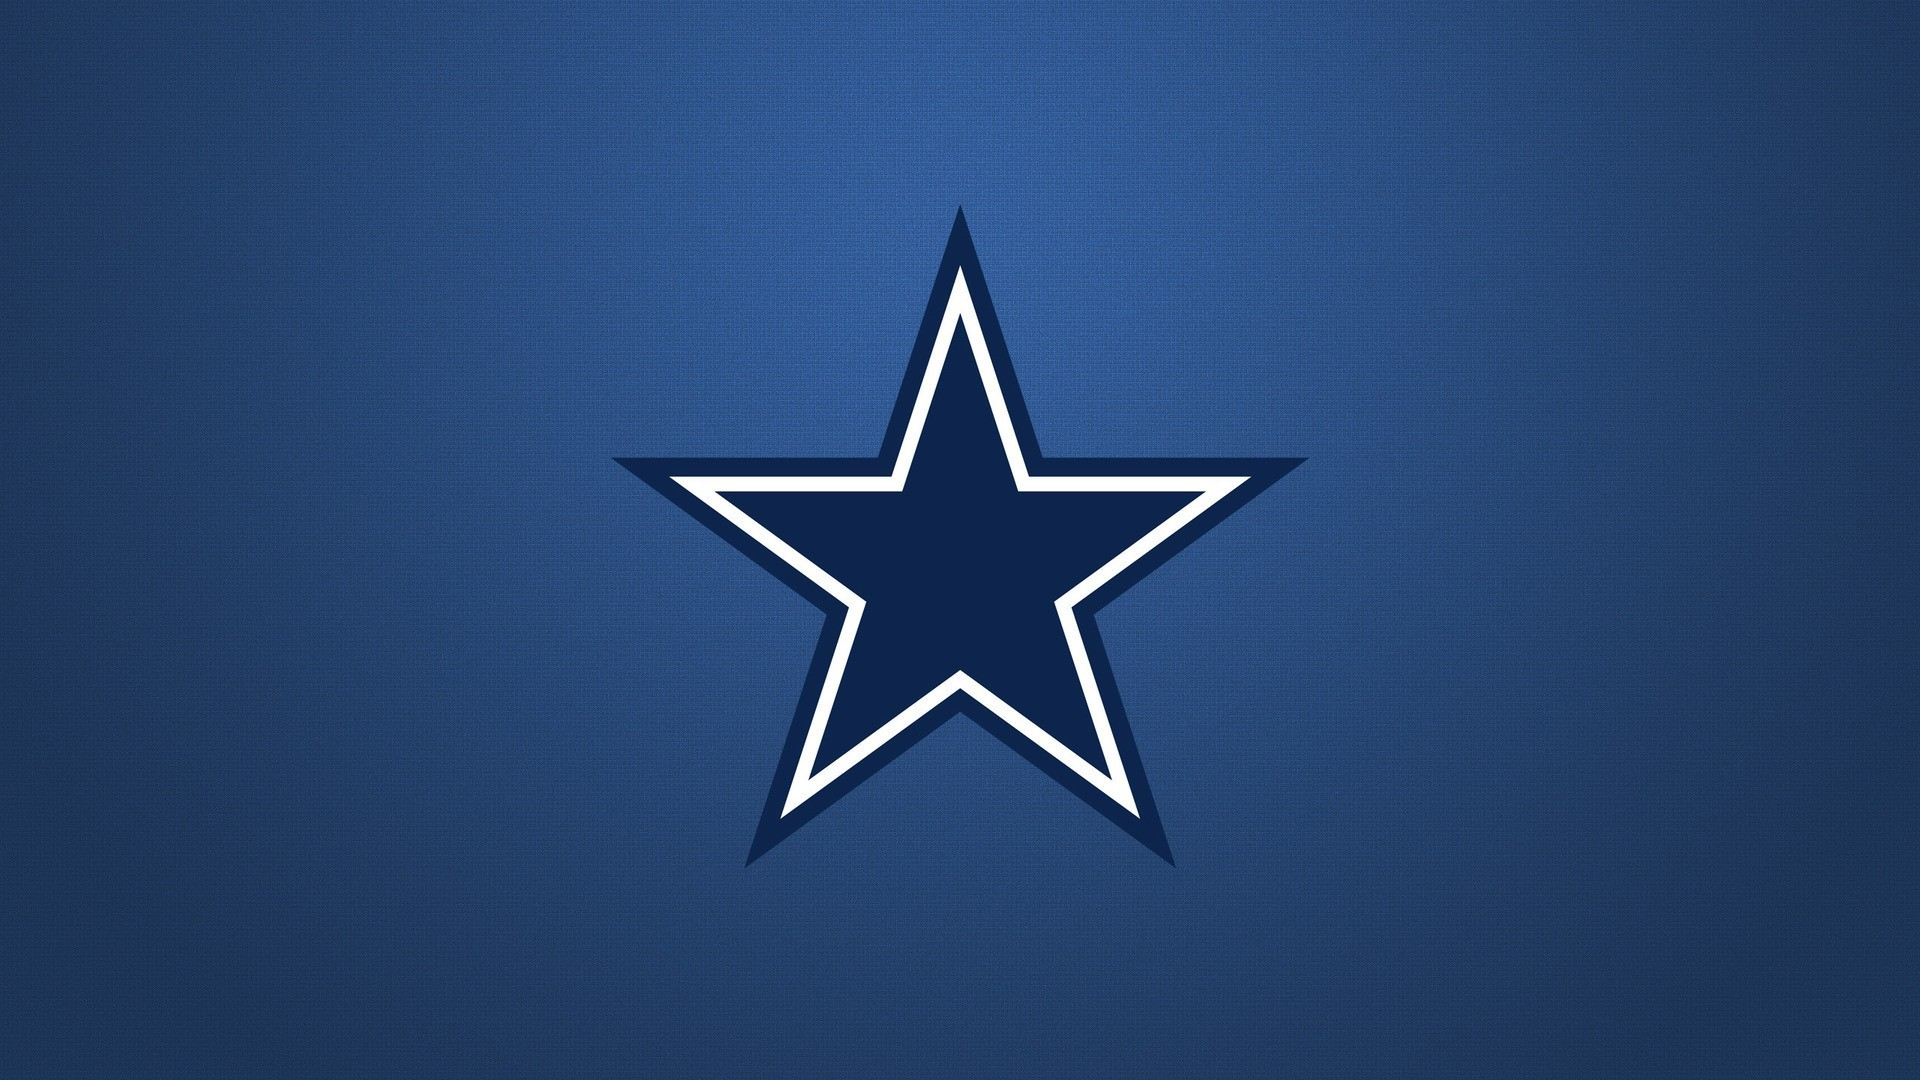 Dallas Cowboys wallpaper wallpaper | Dallas Cowboys wallpapers .